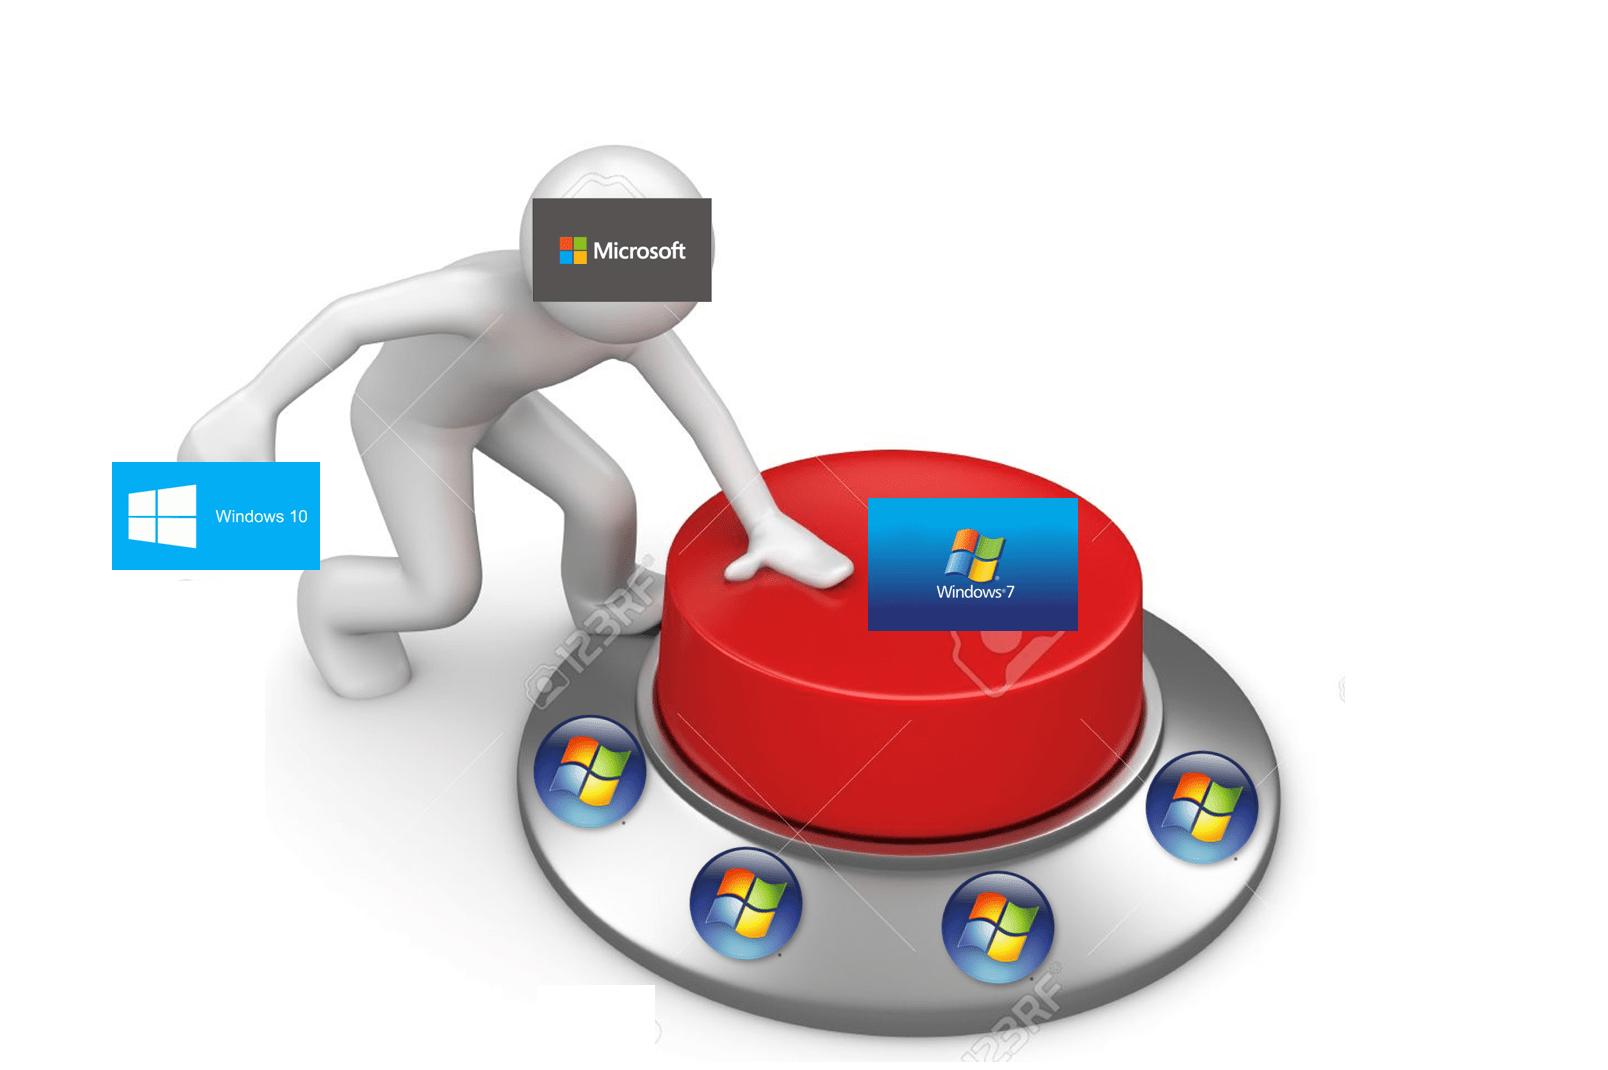 Microsoft elimina windoes 7 El fin de Windows 7